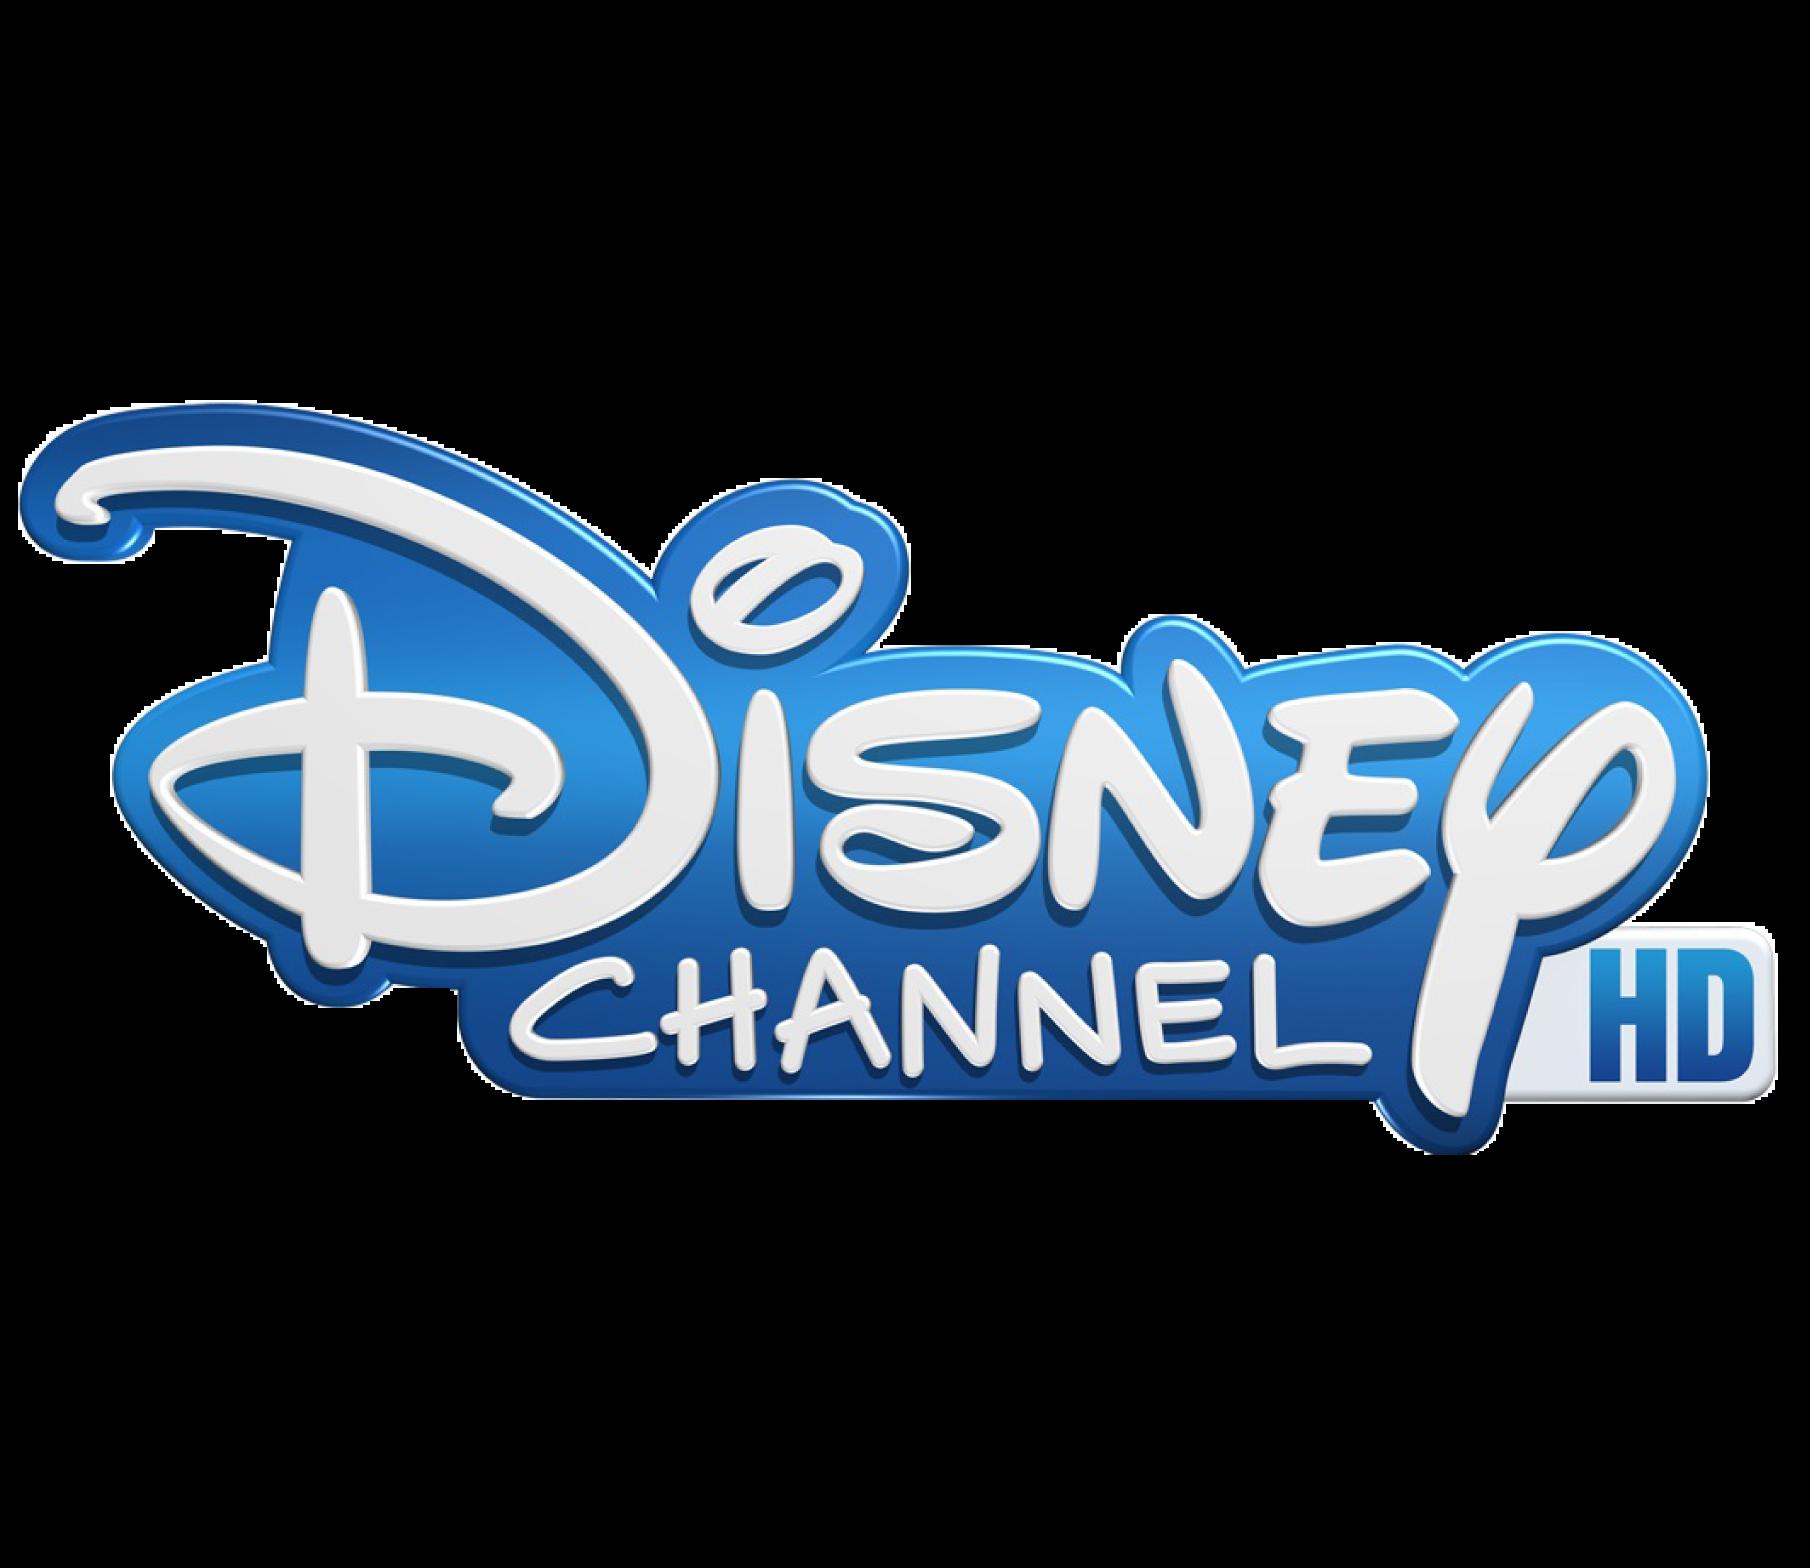 Canal Disney Channel HD